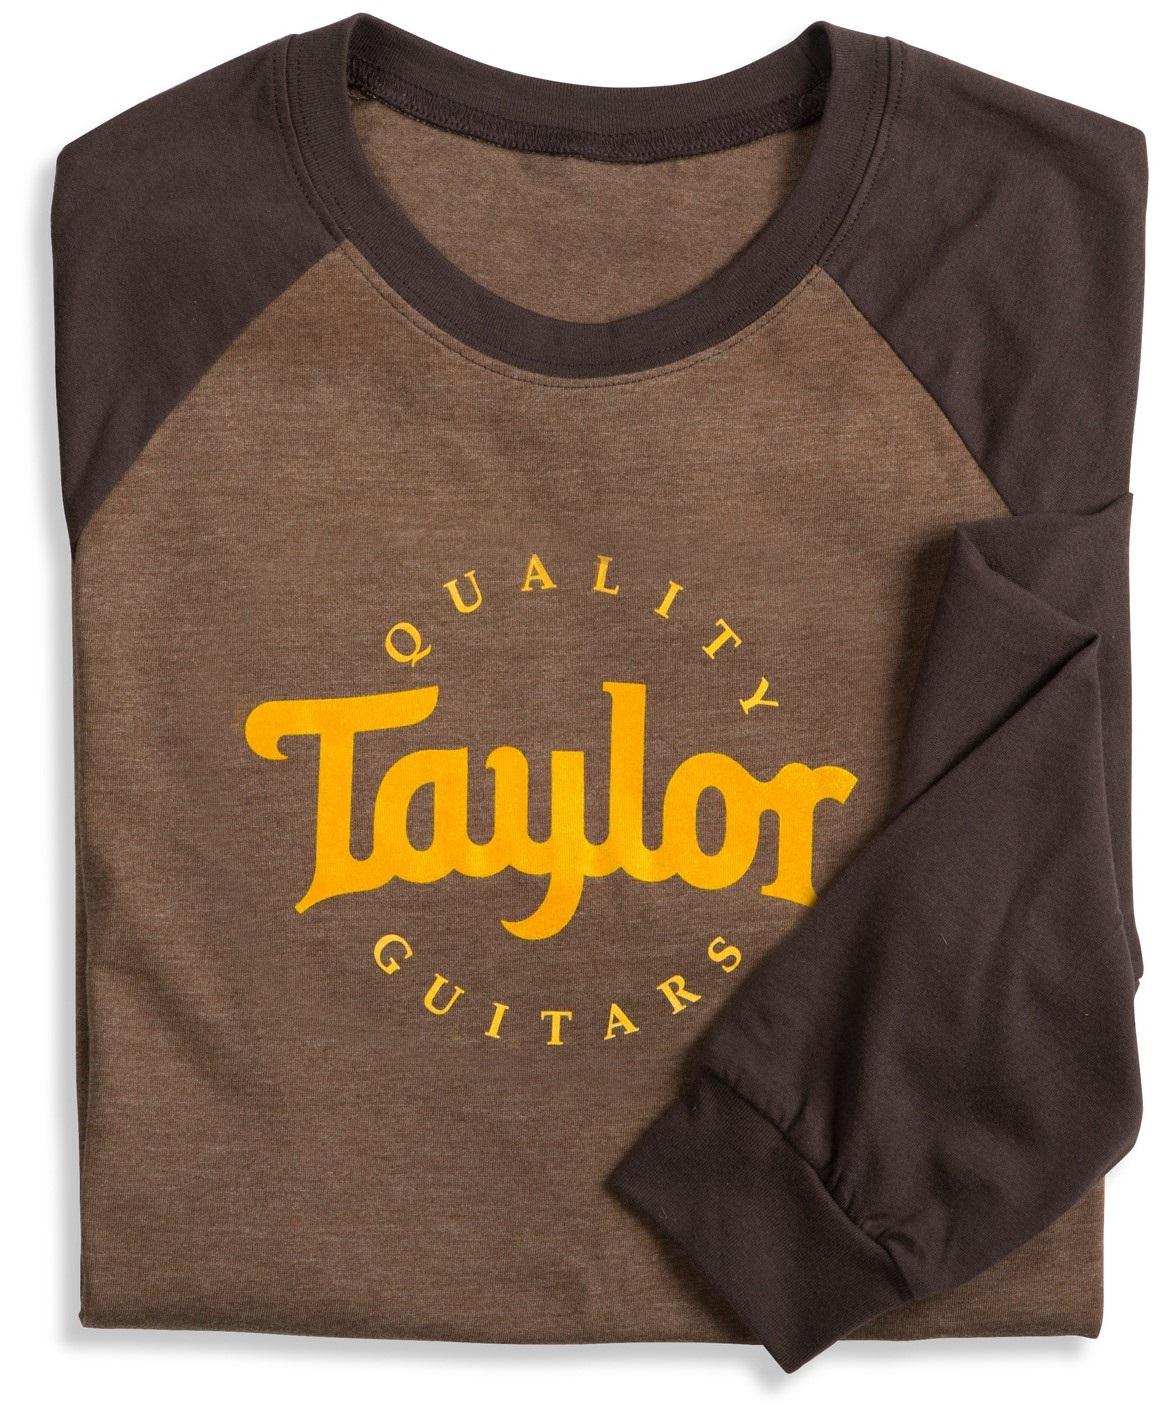 Taylor Baseball T-Shirt Long Sleeve Brown XXL